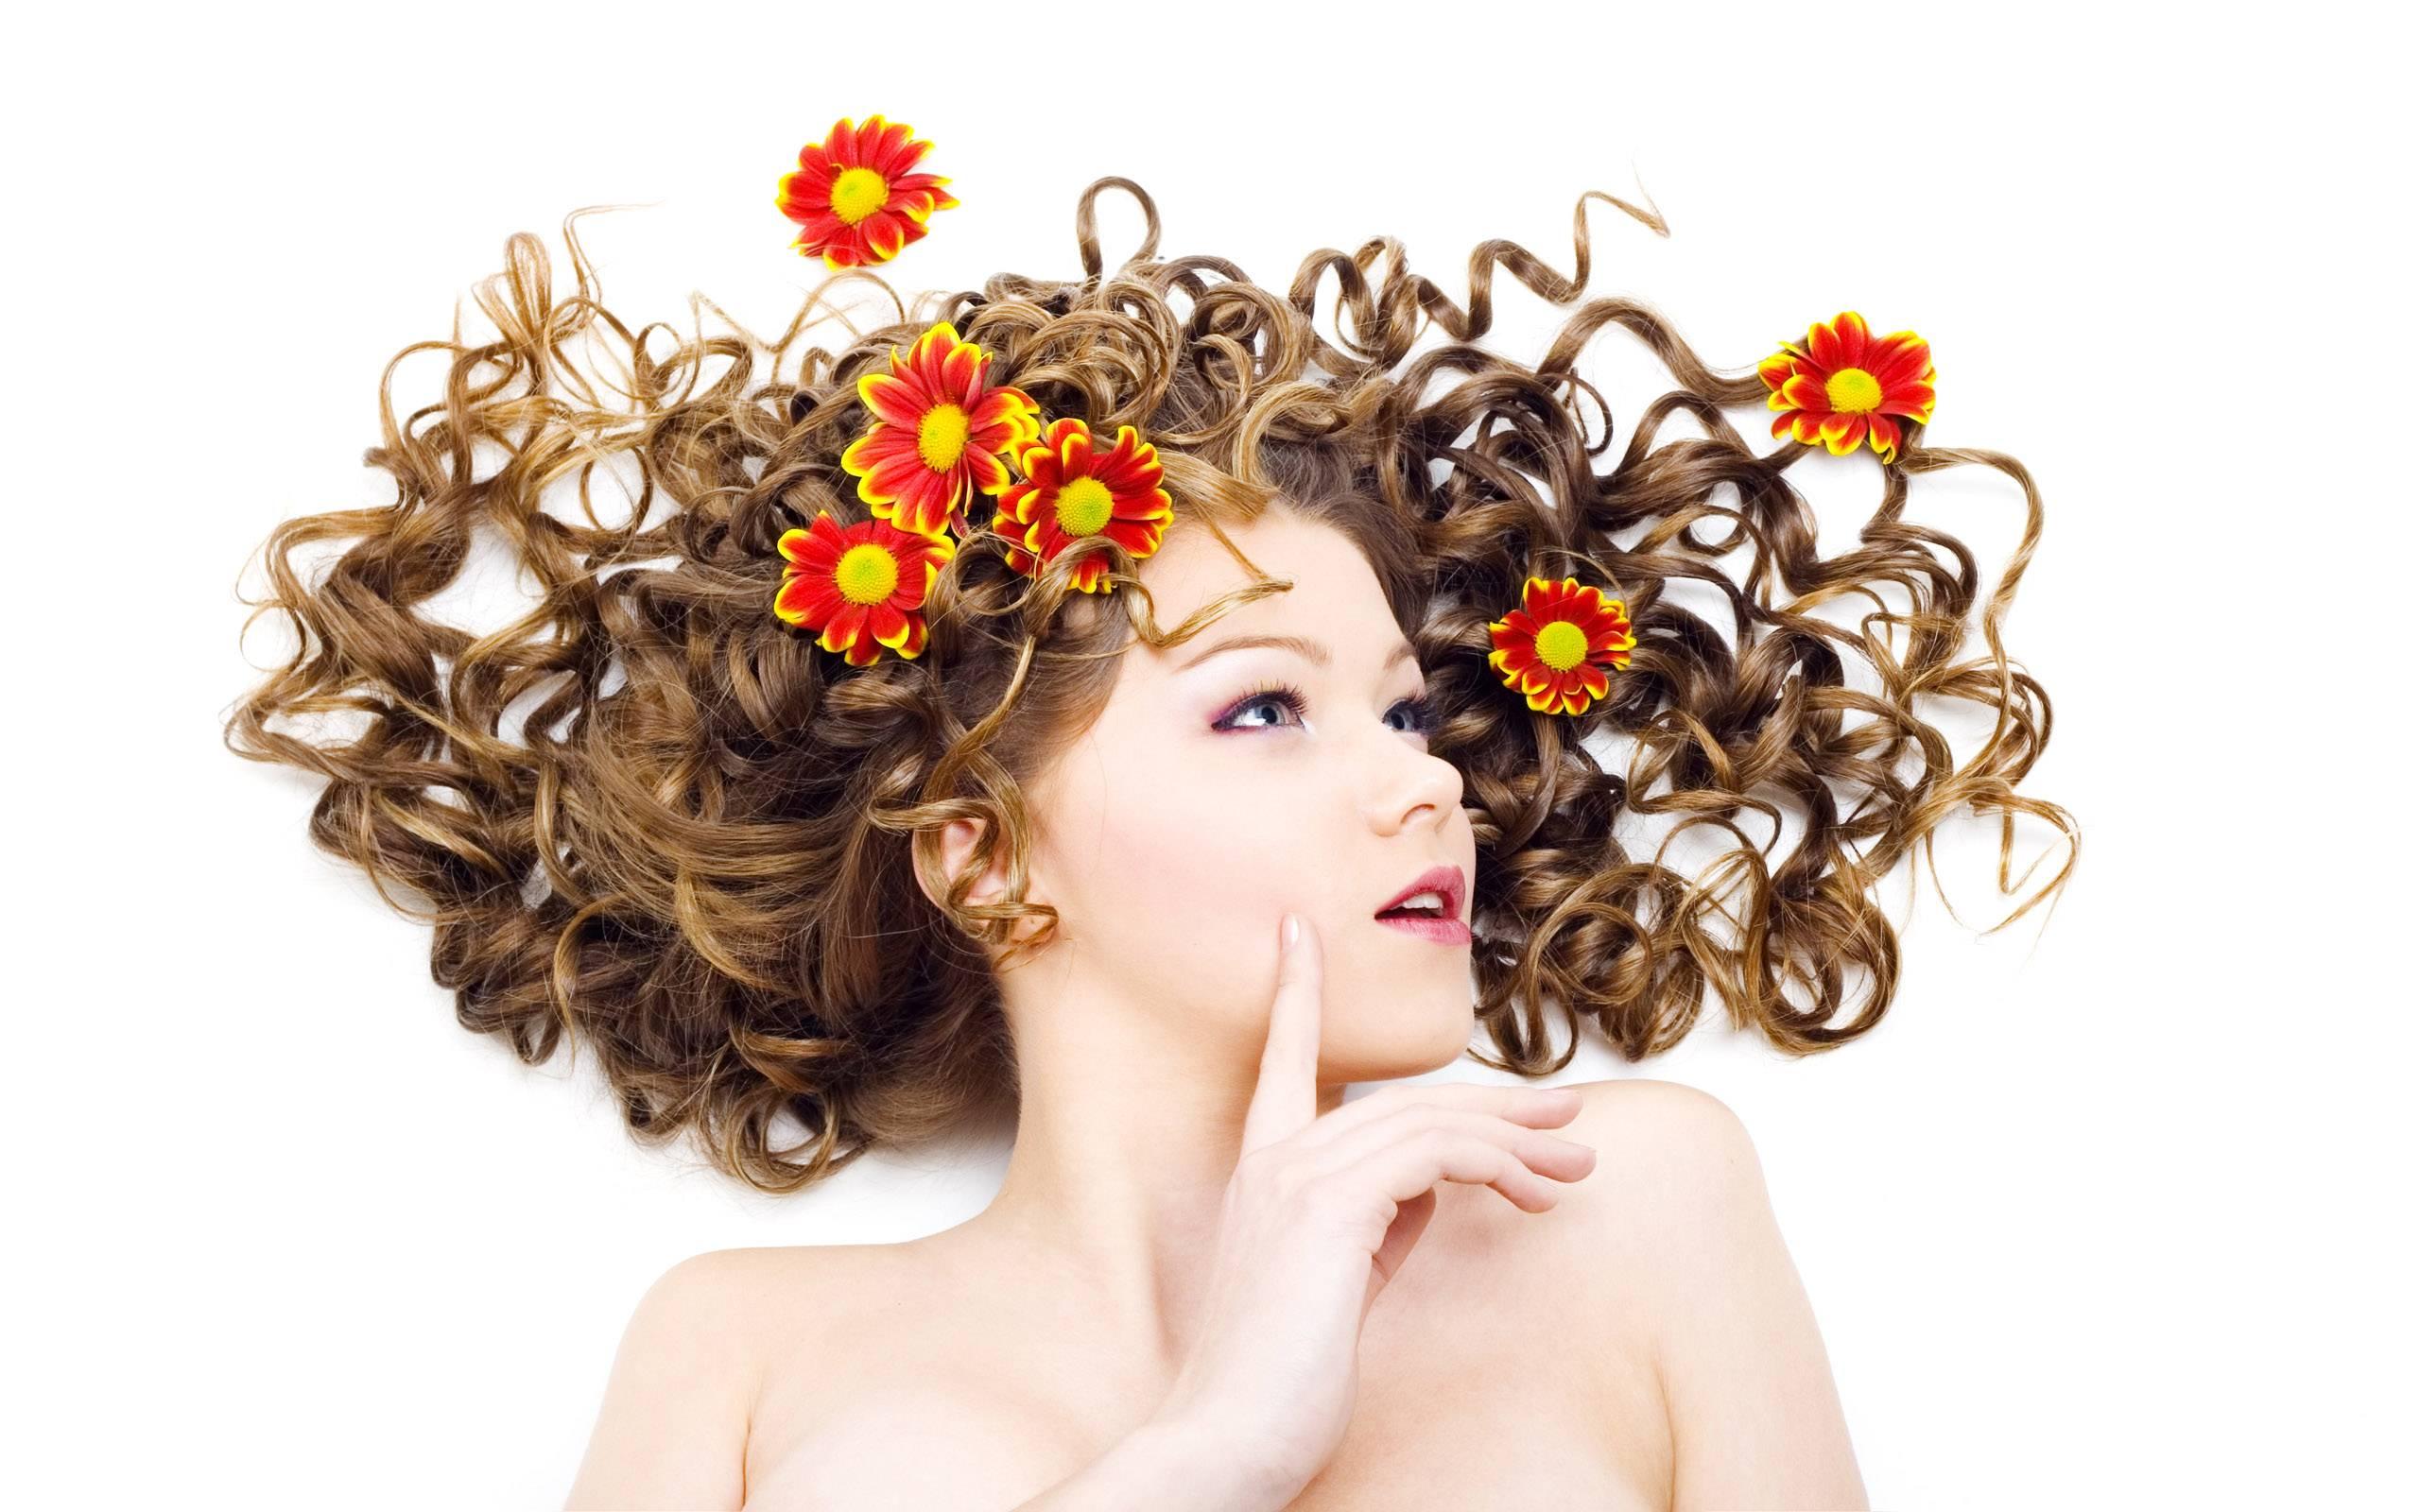 Hair Trend Alert: แฟชั่นทรงผมสุดชิคสำหรับซัมเมอร์ 2016